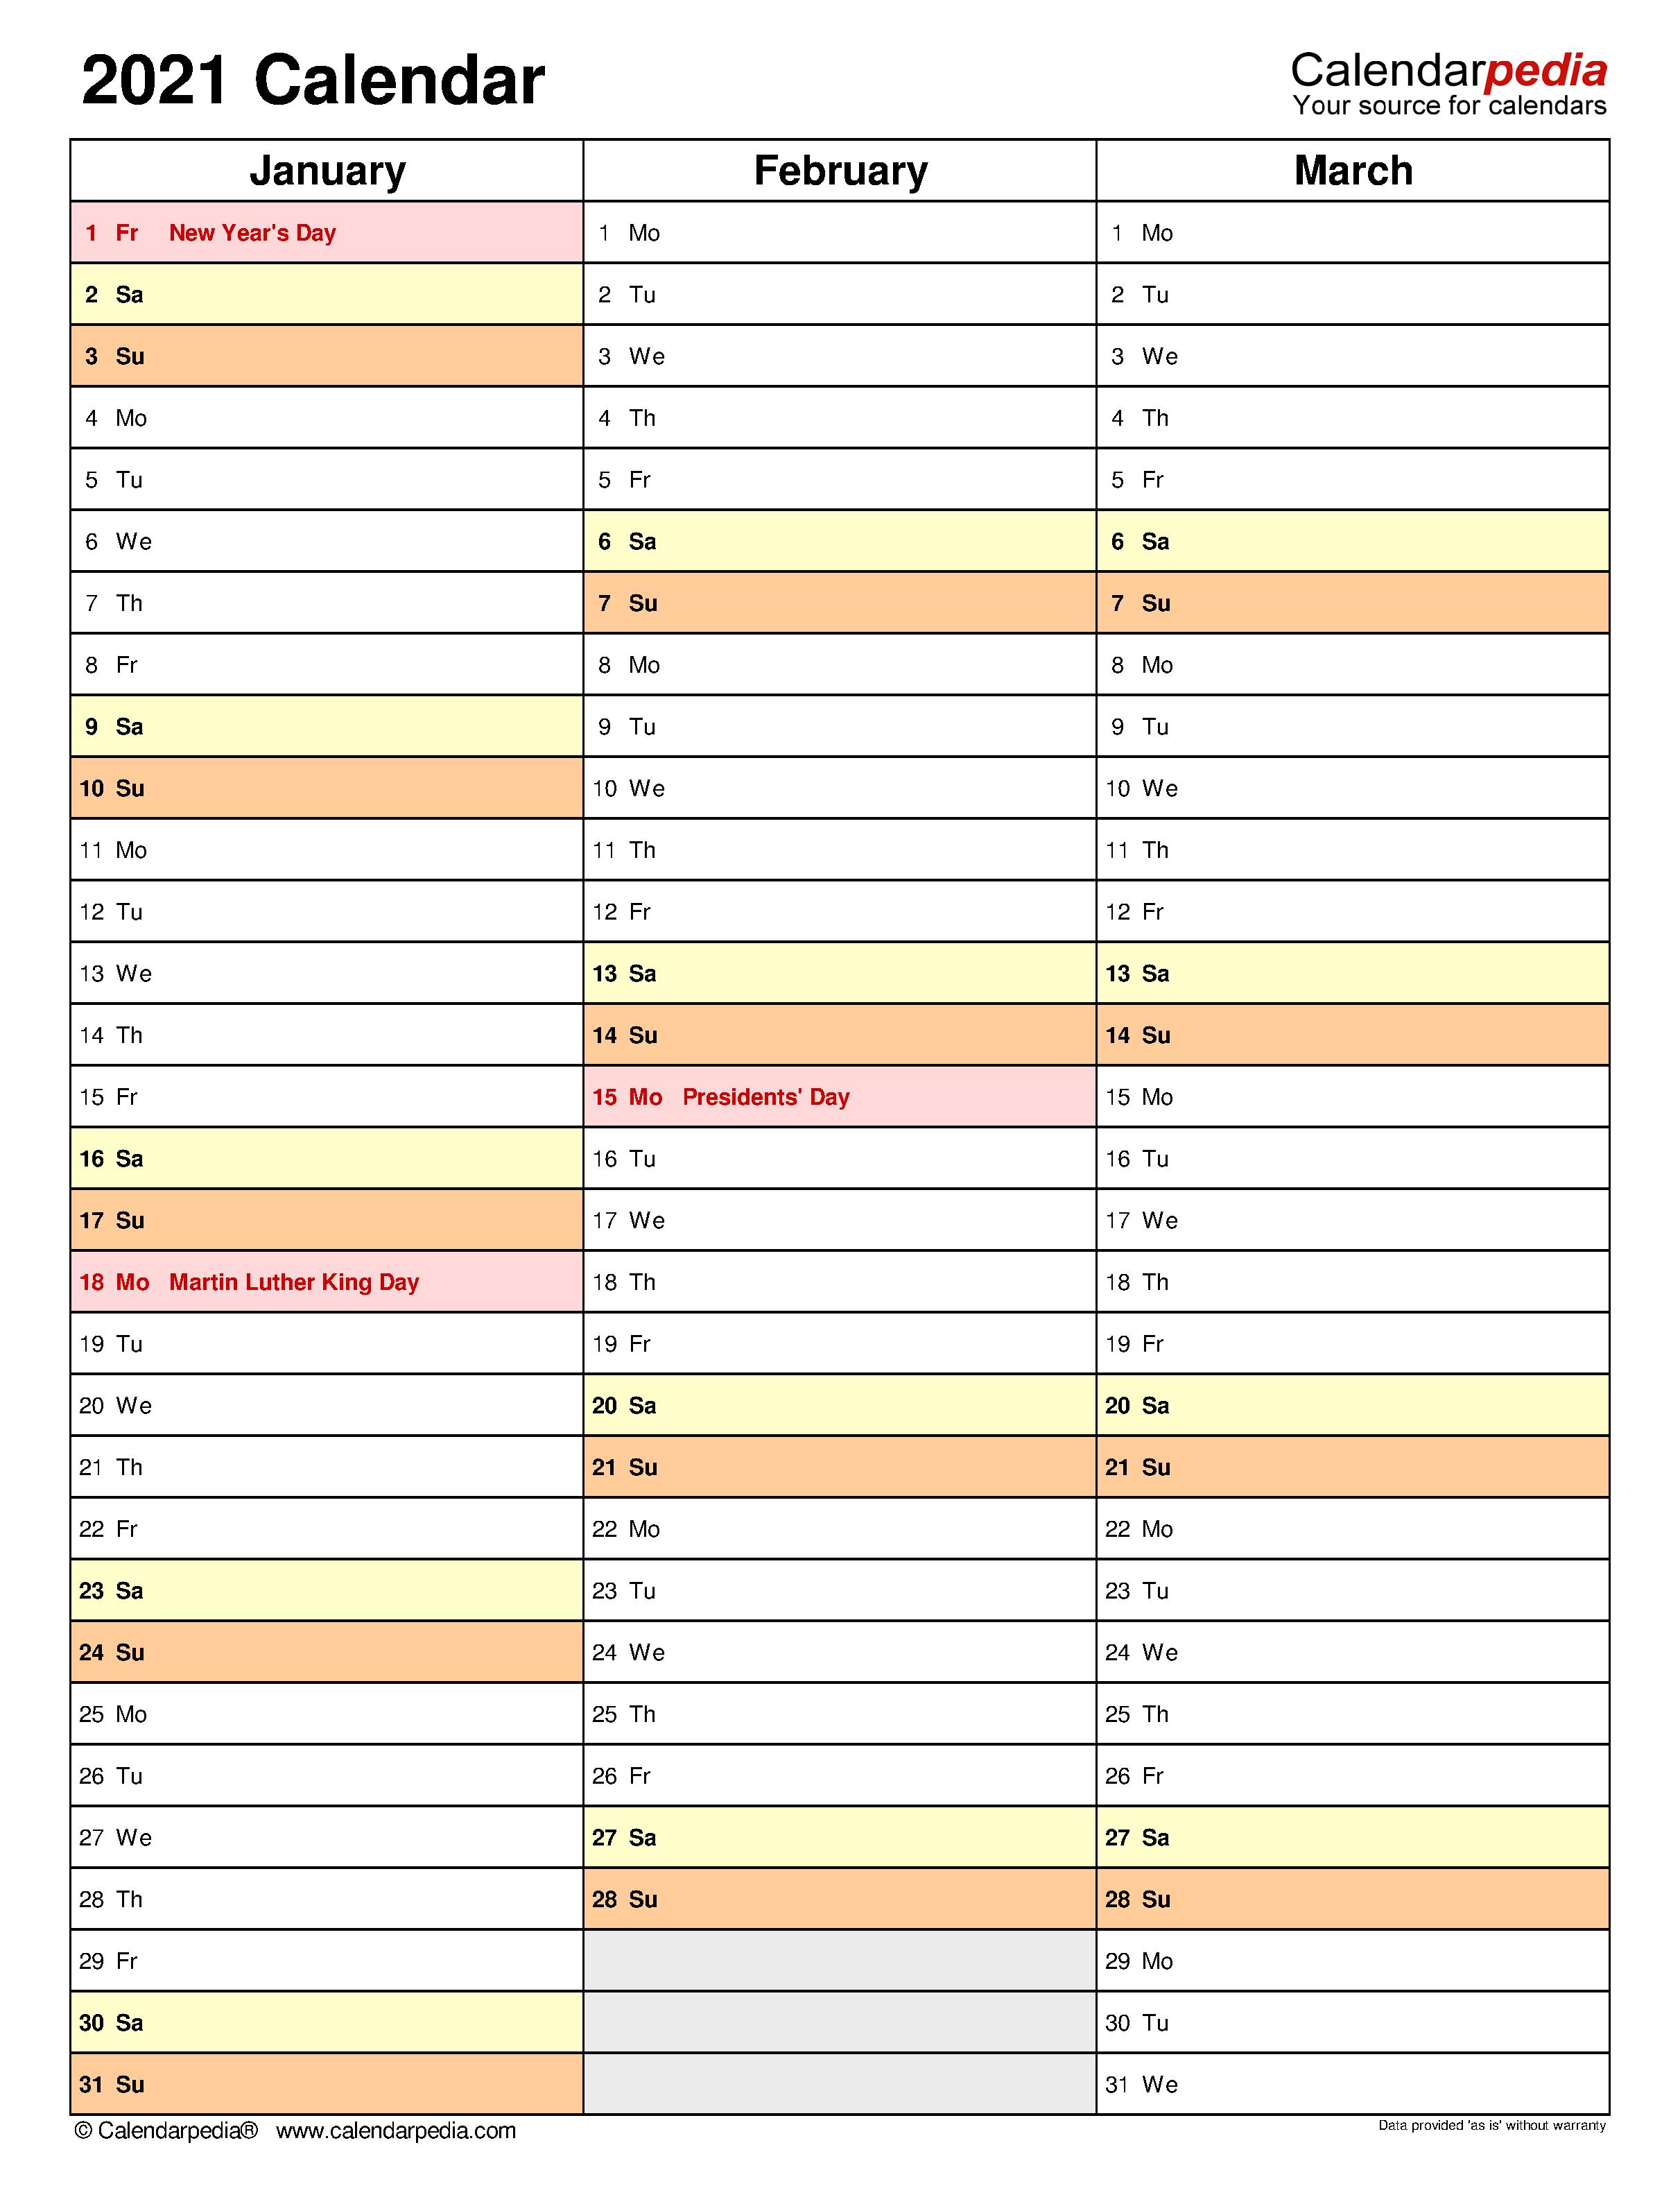 2021 Calendar - Free Printable Microsoft Word Templates